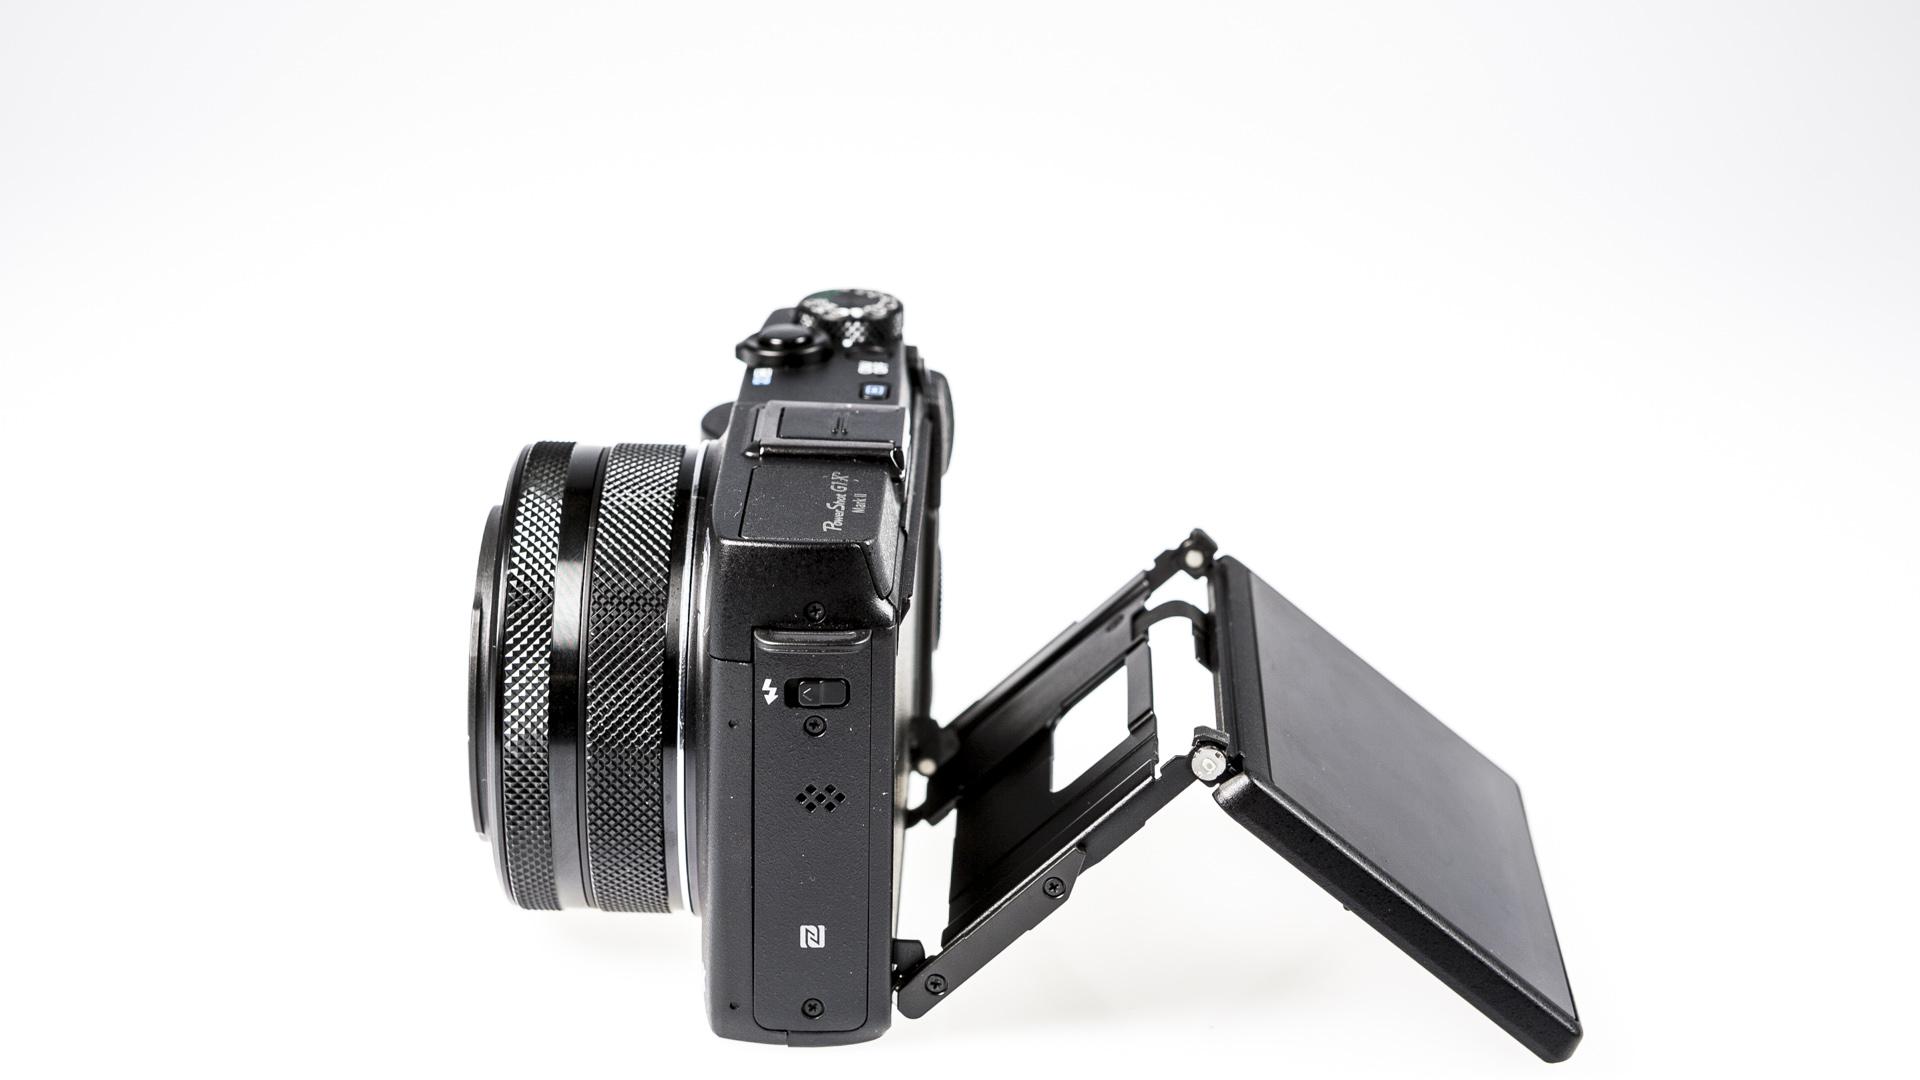 ������ � ����� Canon PowerShot G1 X Mark II